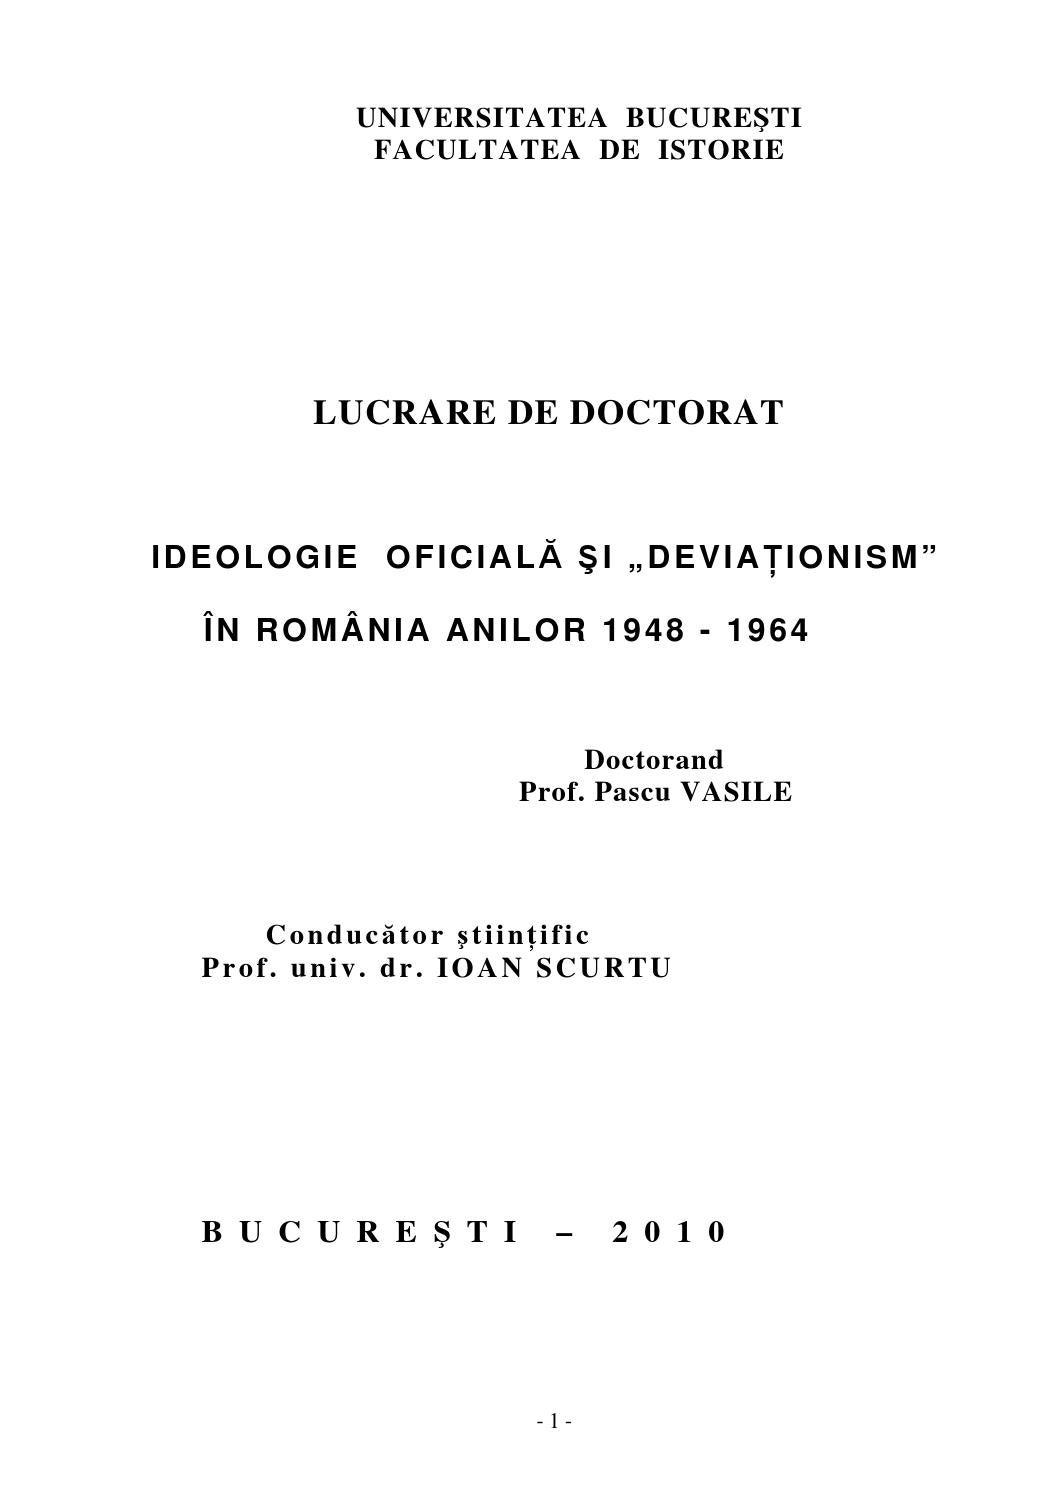 Decriptare RK VLKSM. Vlksm: istoric, obiective și obiective ale organizației